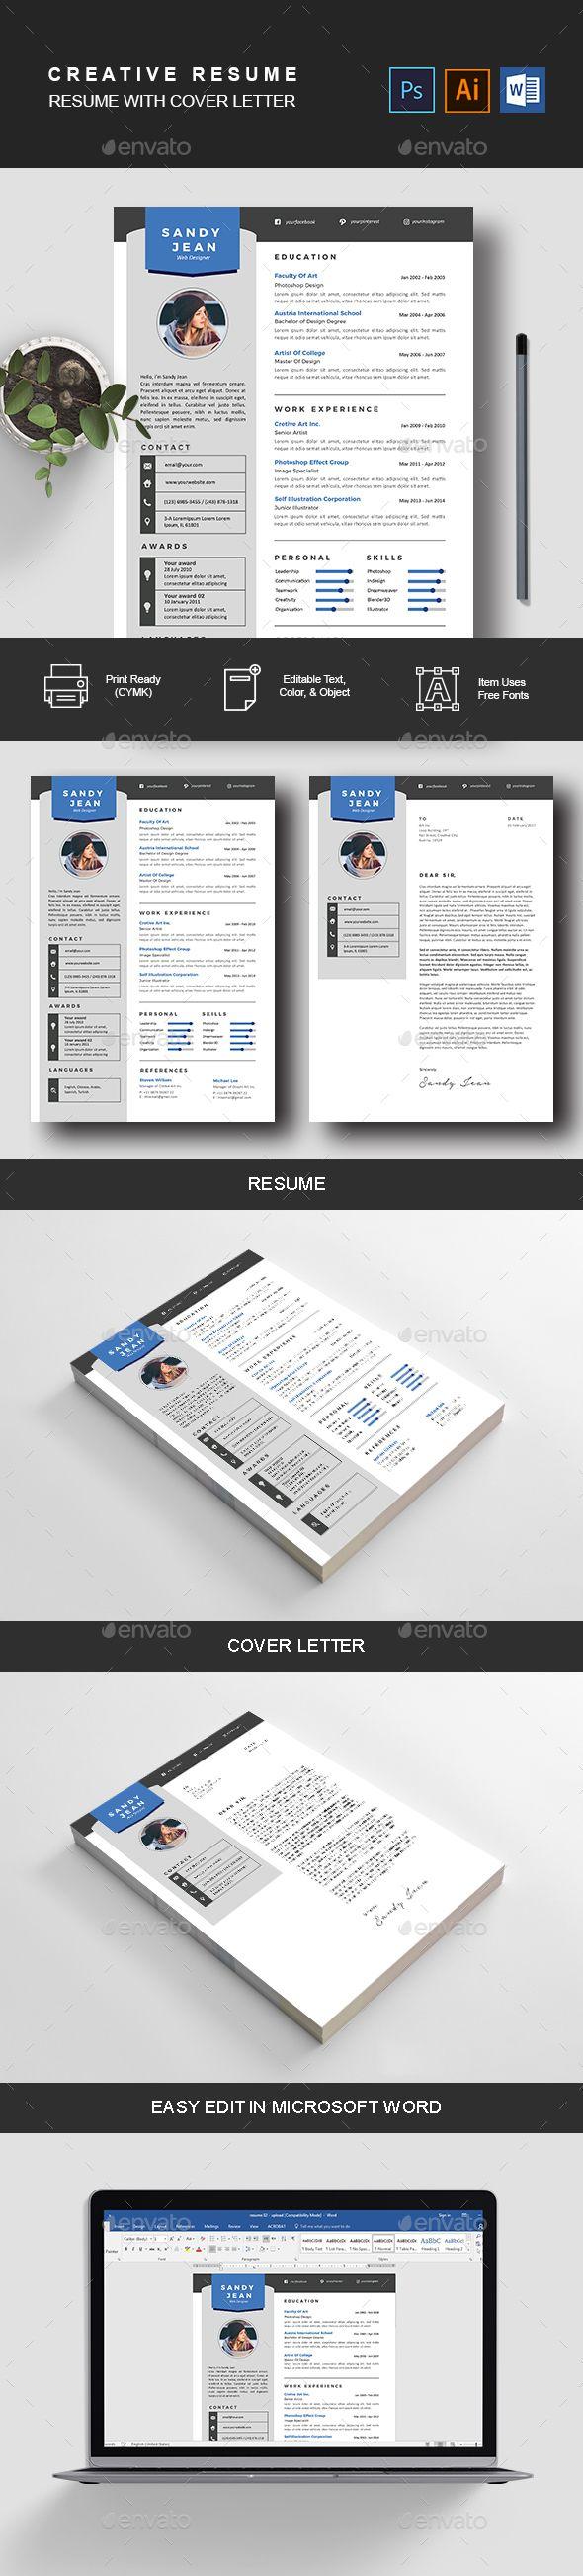 Modern Resume u0026 Cover Letter Design Template